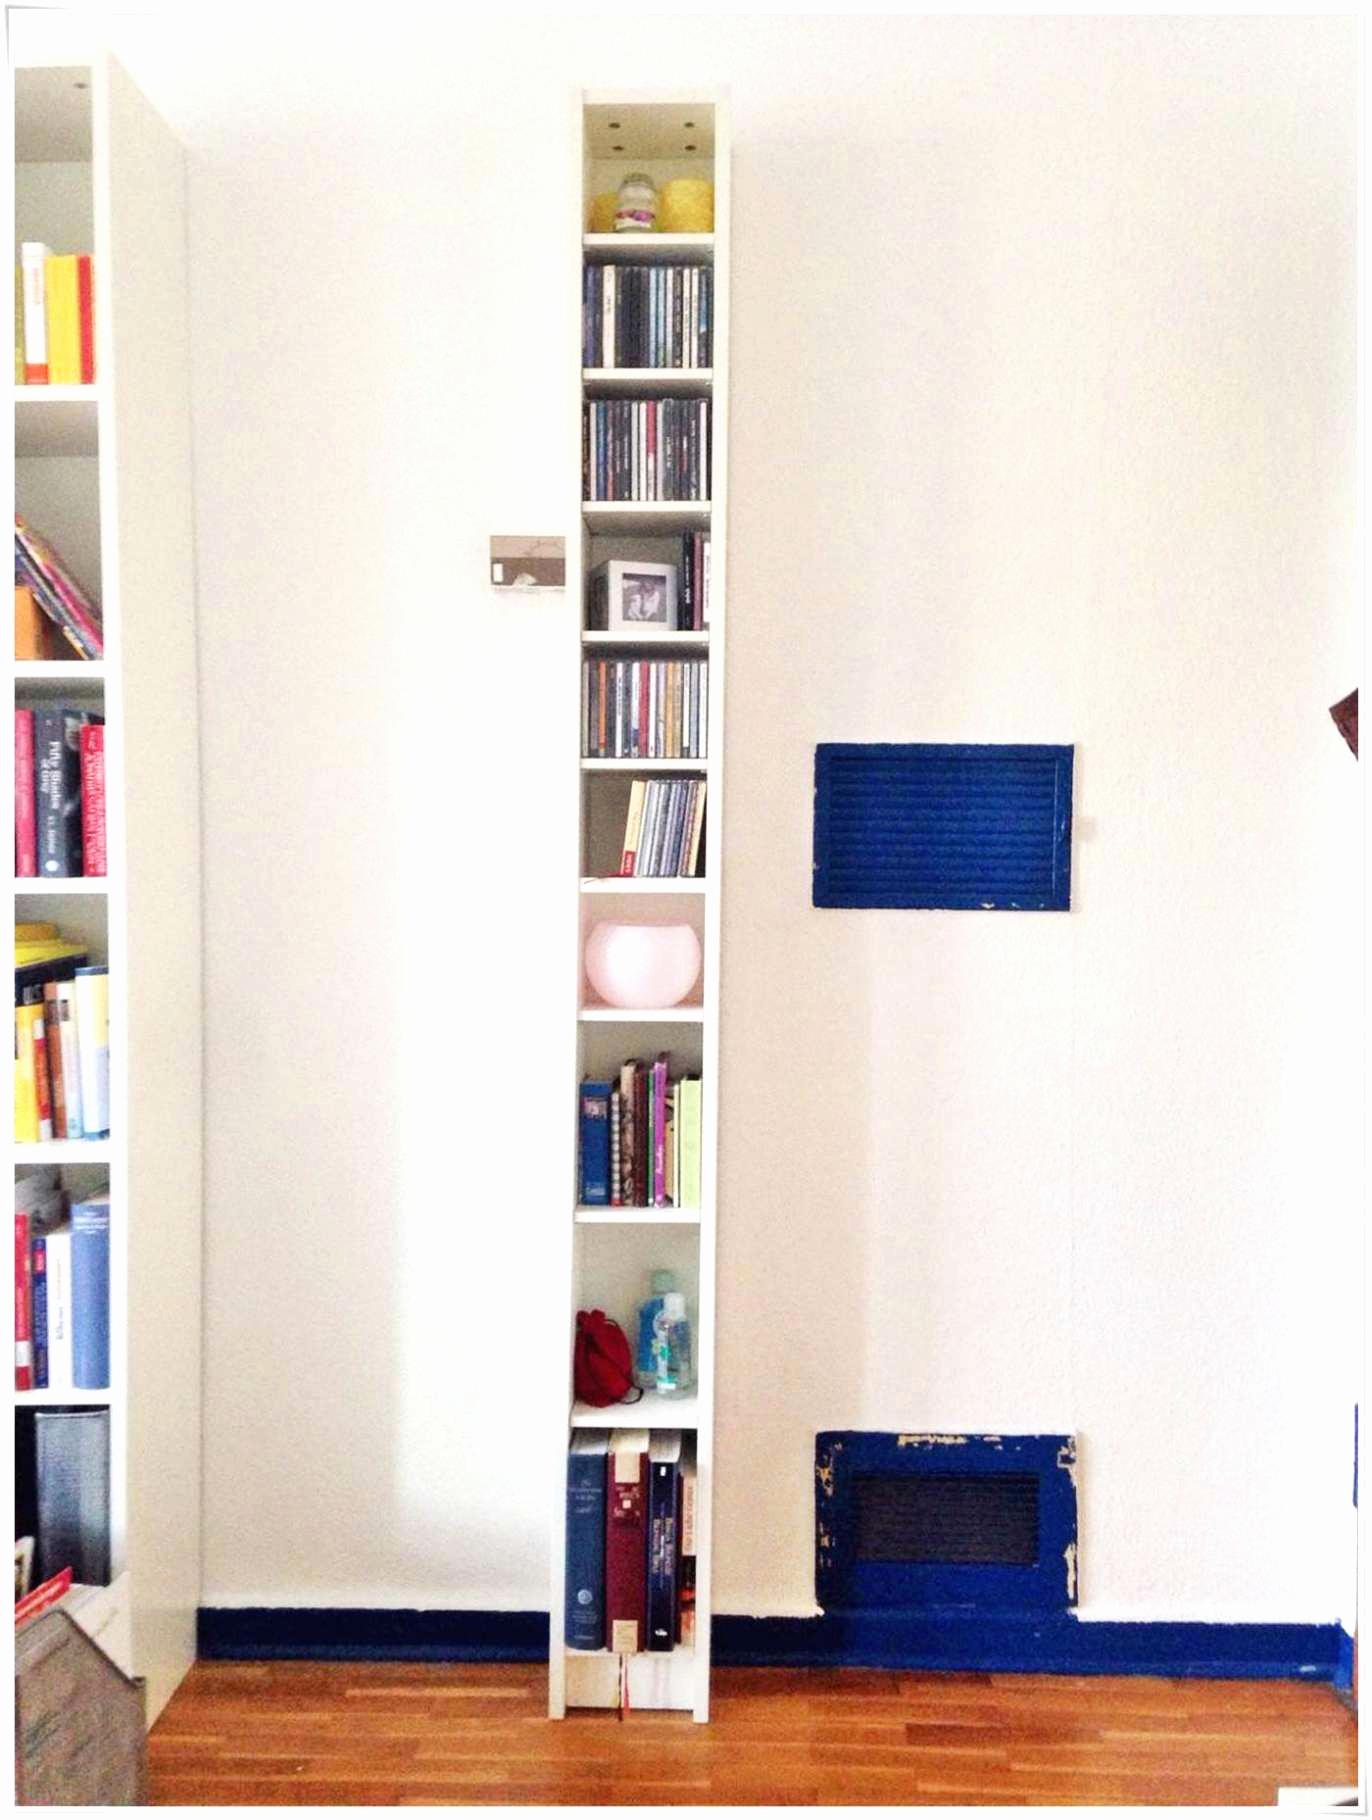 Full Size of Bett Selber Zusammenstellen Ikea Massivholz Selbst Hasena Zum Kopfteil Boxspring Machen Regal Treppe Bauen Genial Flaschenregal Hoch Ausklappbar Einfaches Bett Bett Selber Zusammenstellen